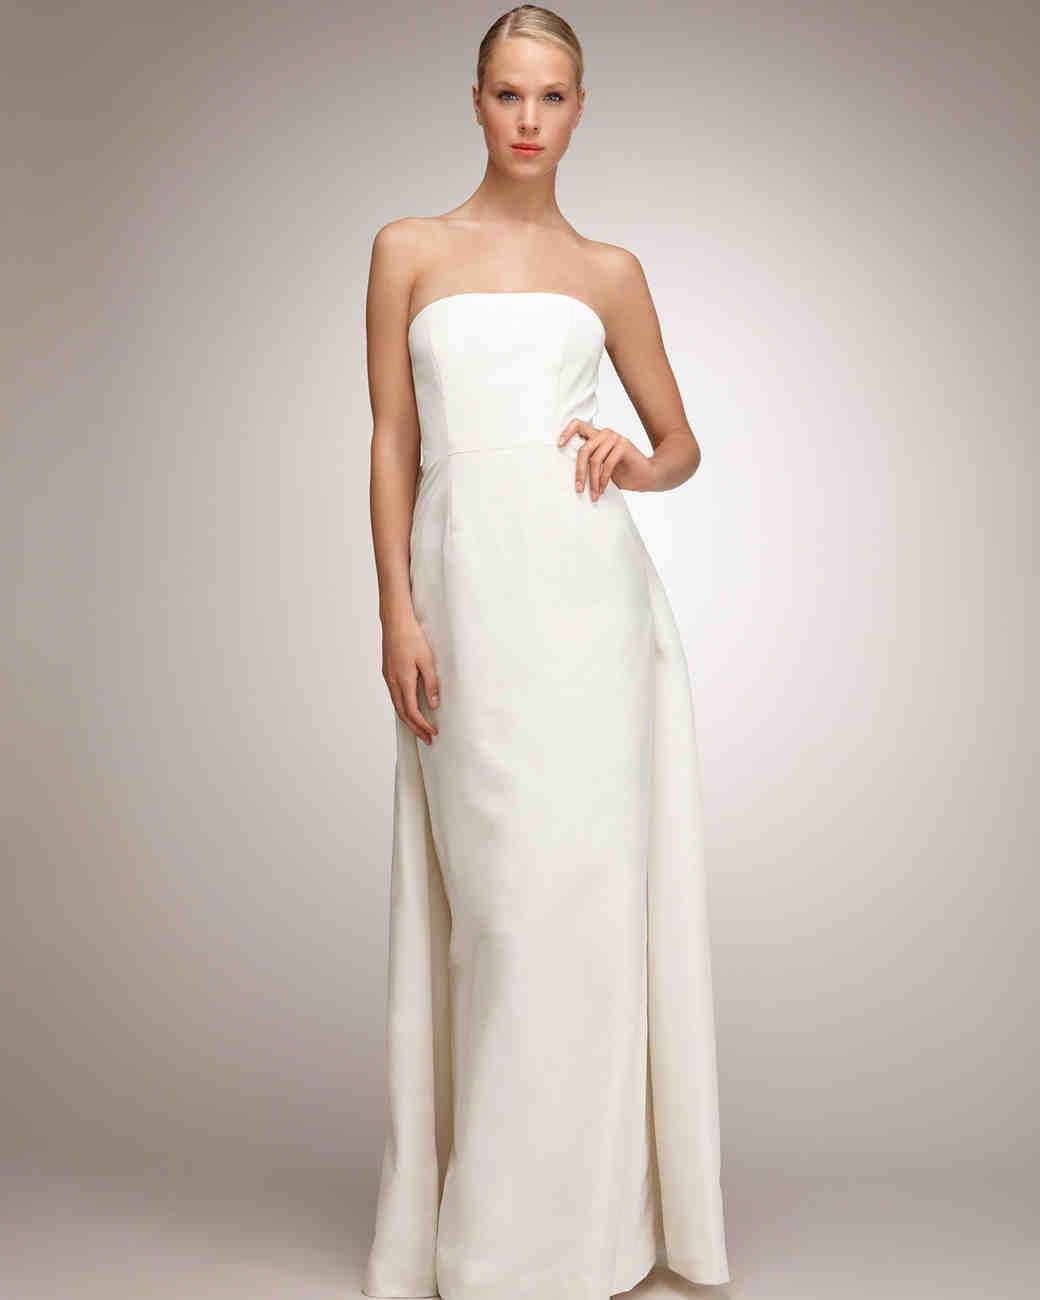 issac-mizrahi-gowns-0611wd1.jpg